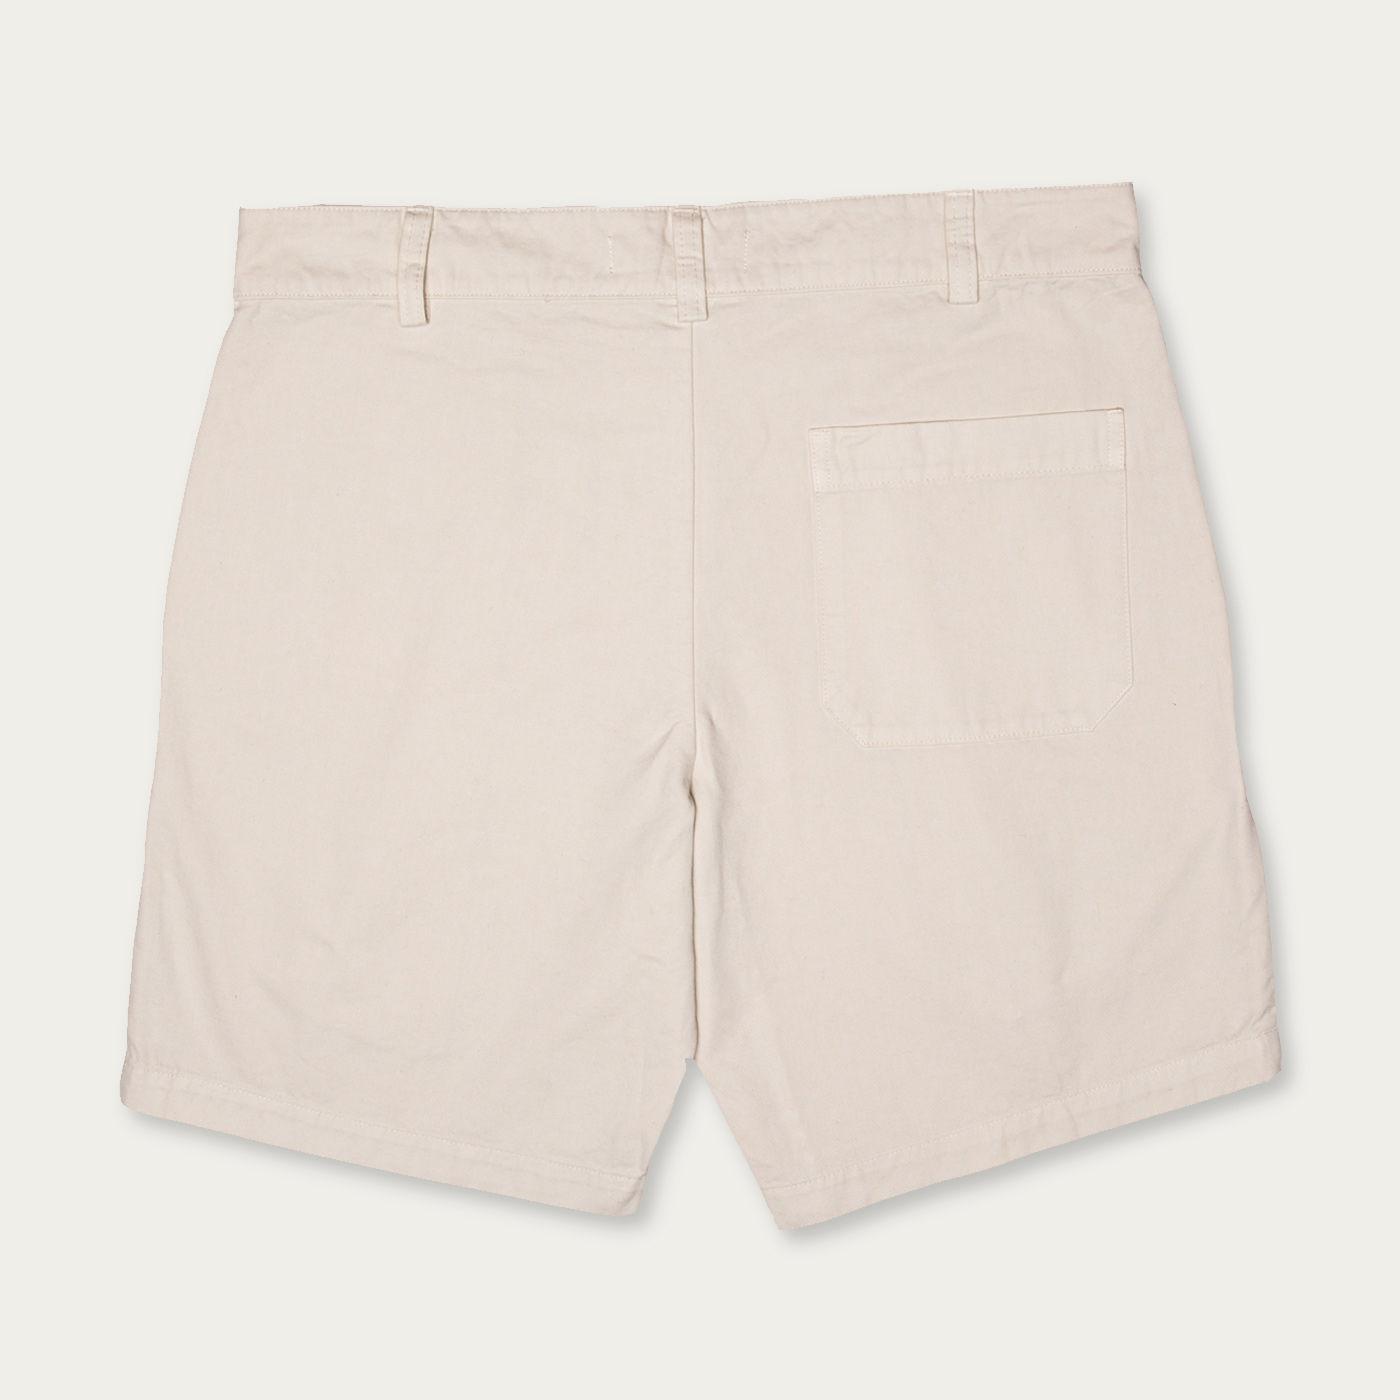 Cream Vintage Cotton Twill Walkshorts | Bombinate